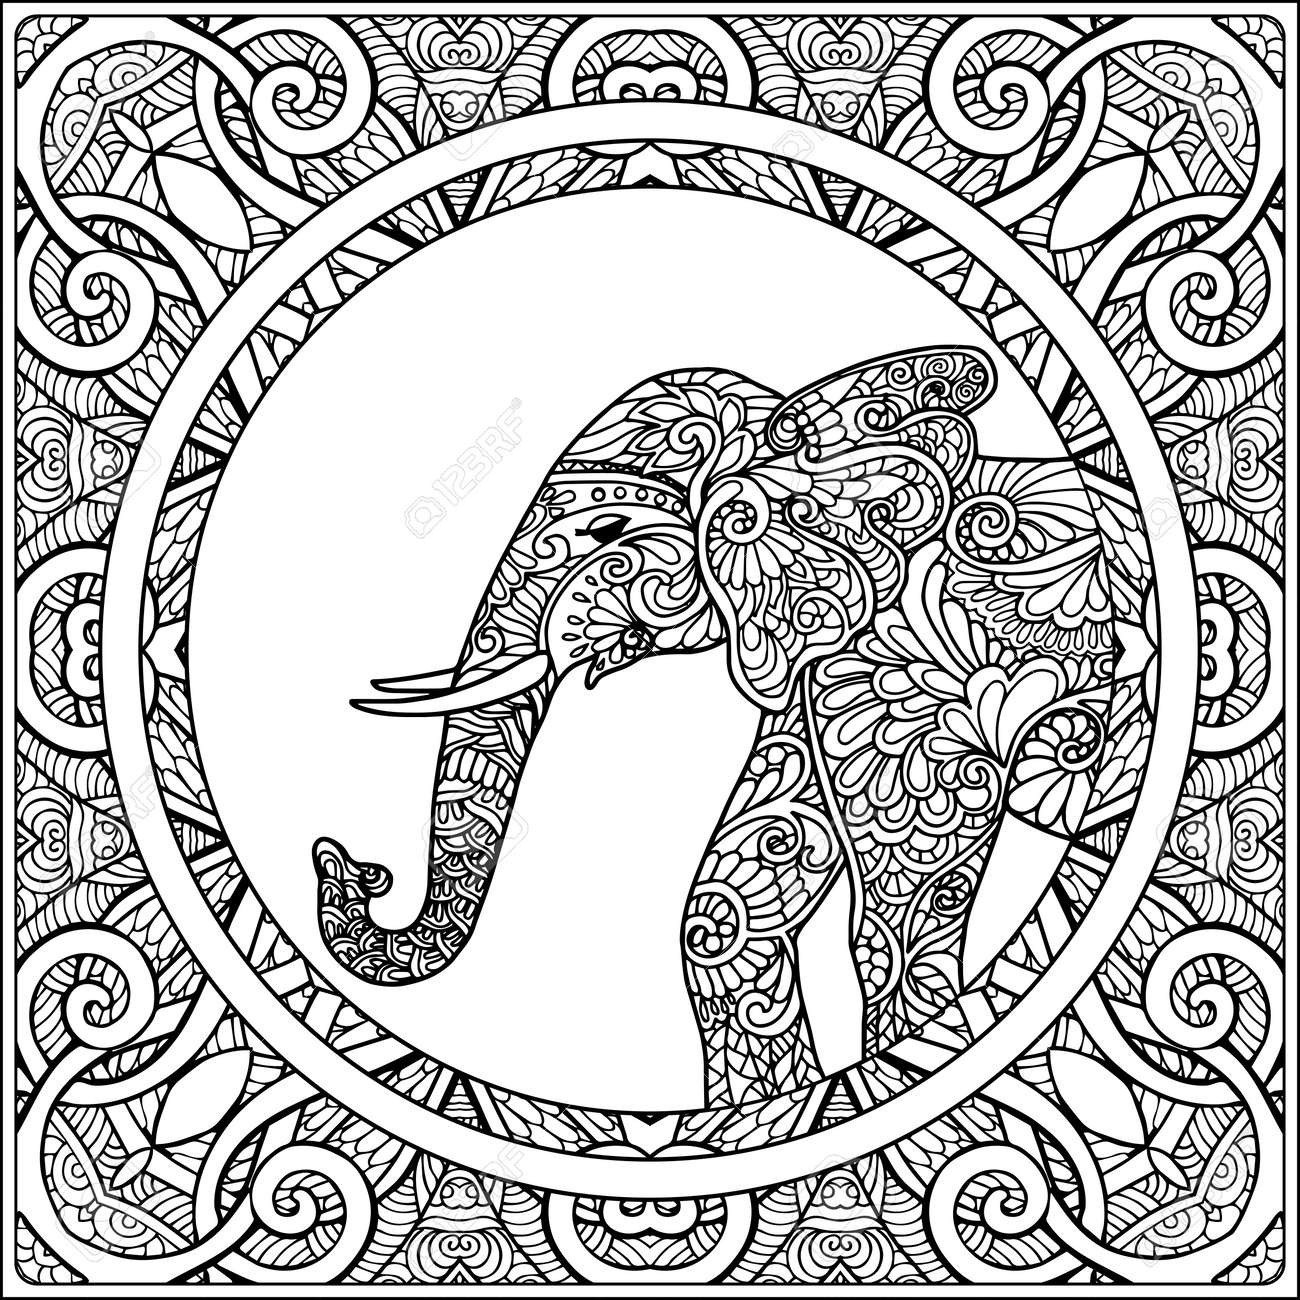 Malvorlage Mit Elefanten Im Dekorativen Mandala Rahmen Malbuch